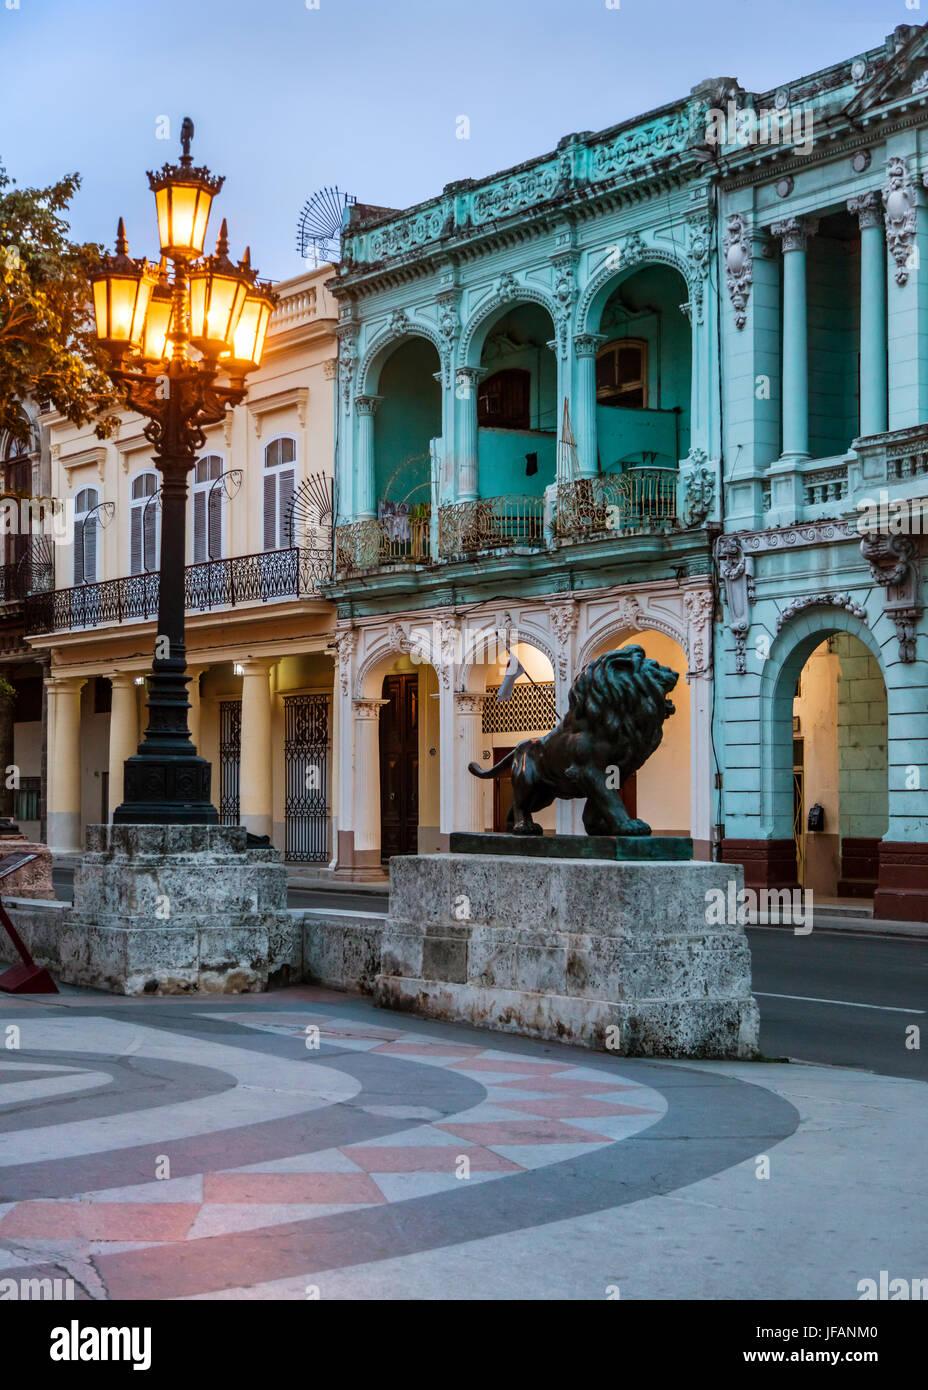 Klassische Gebäude säumen den PASEO DE MARTI, bekannt als der PRADO - Havanna, Kuba Stockbild